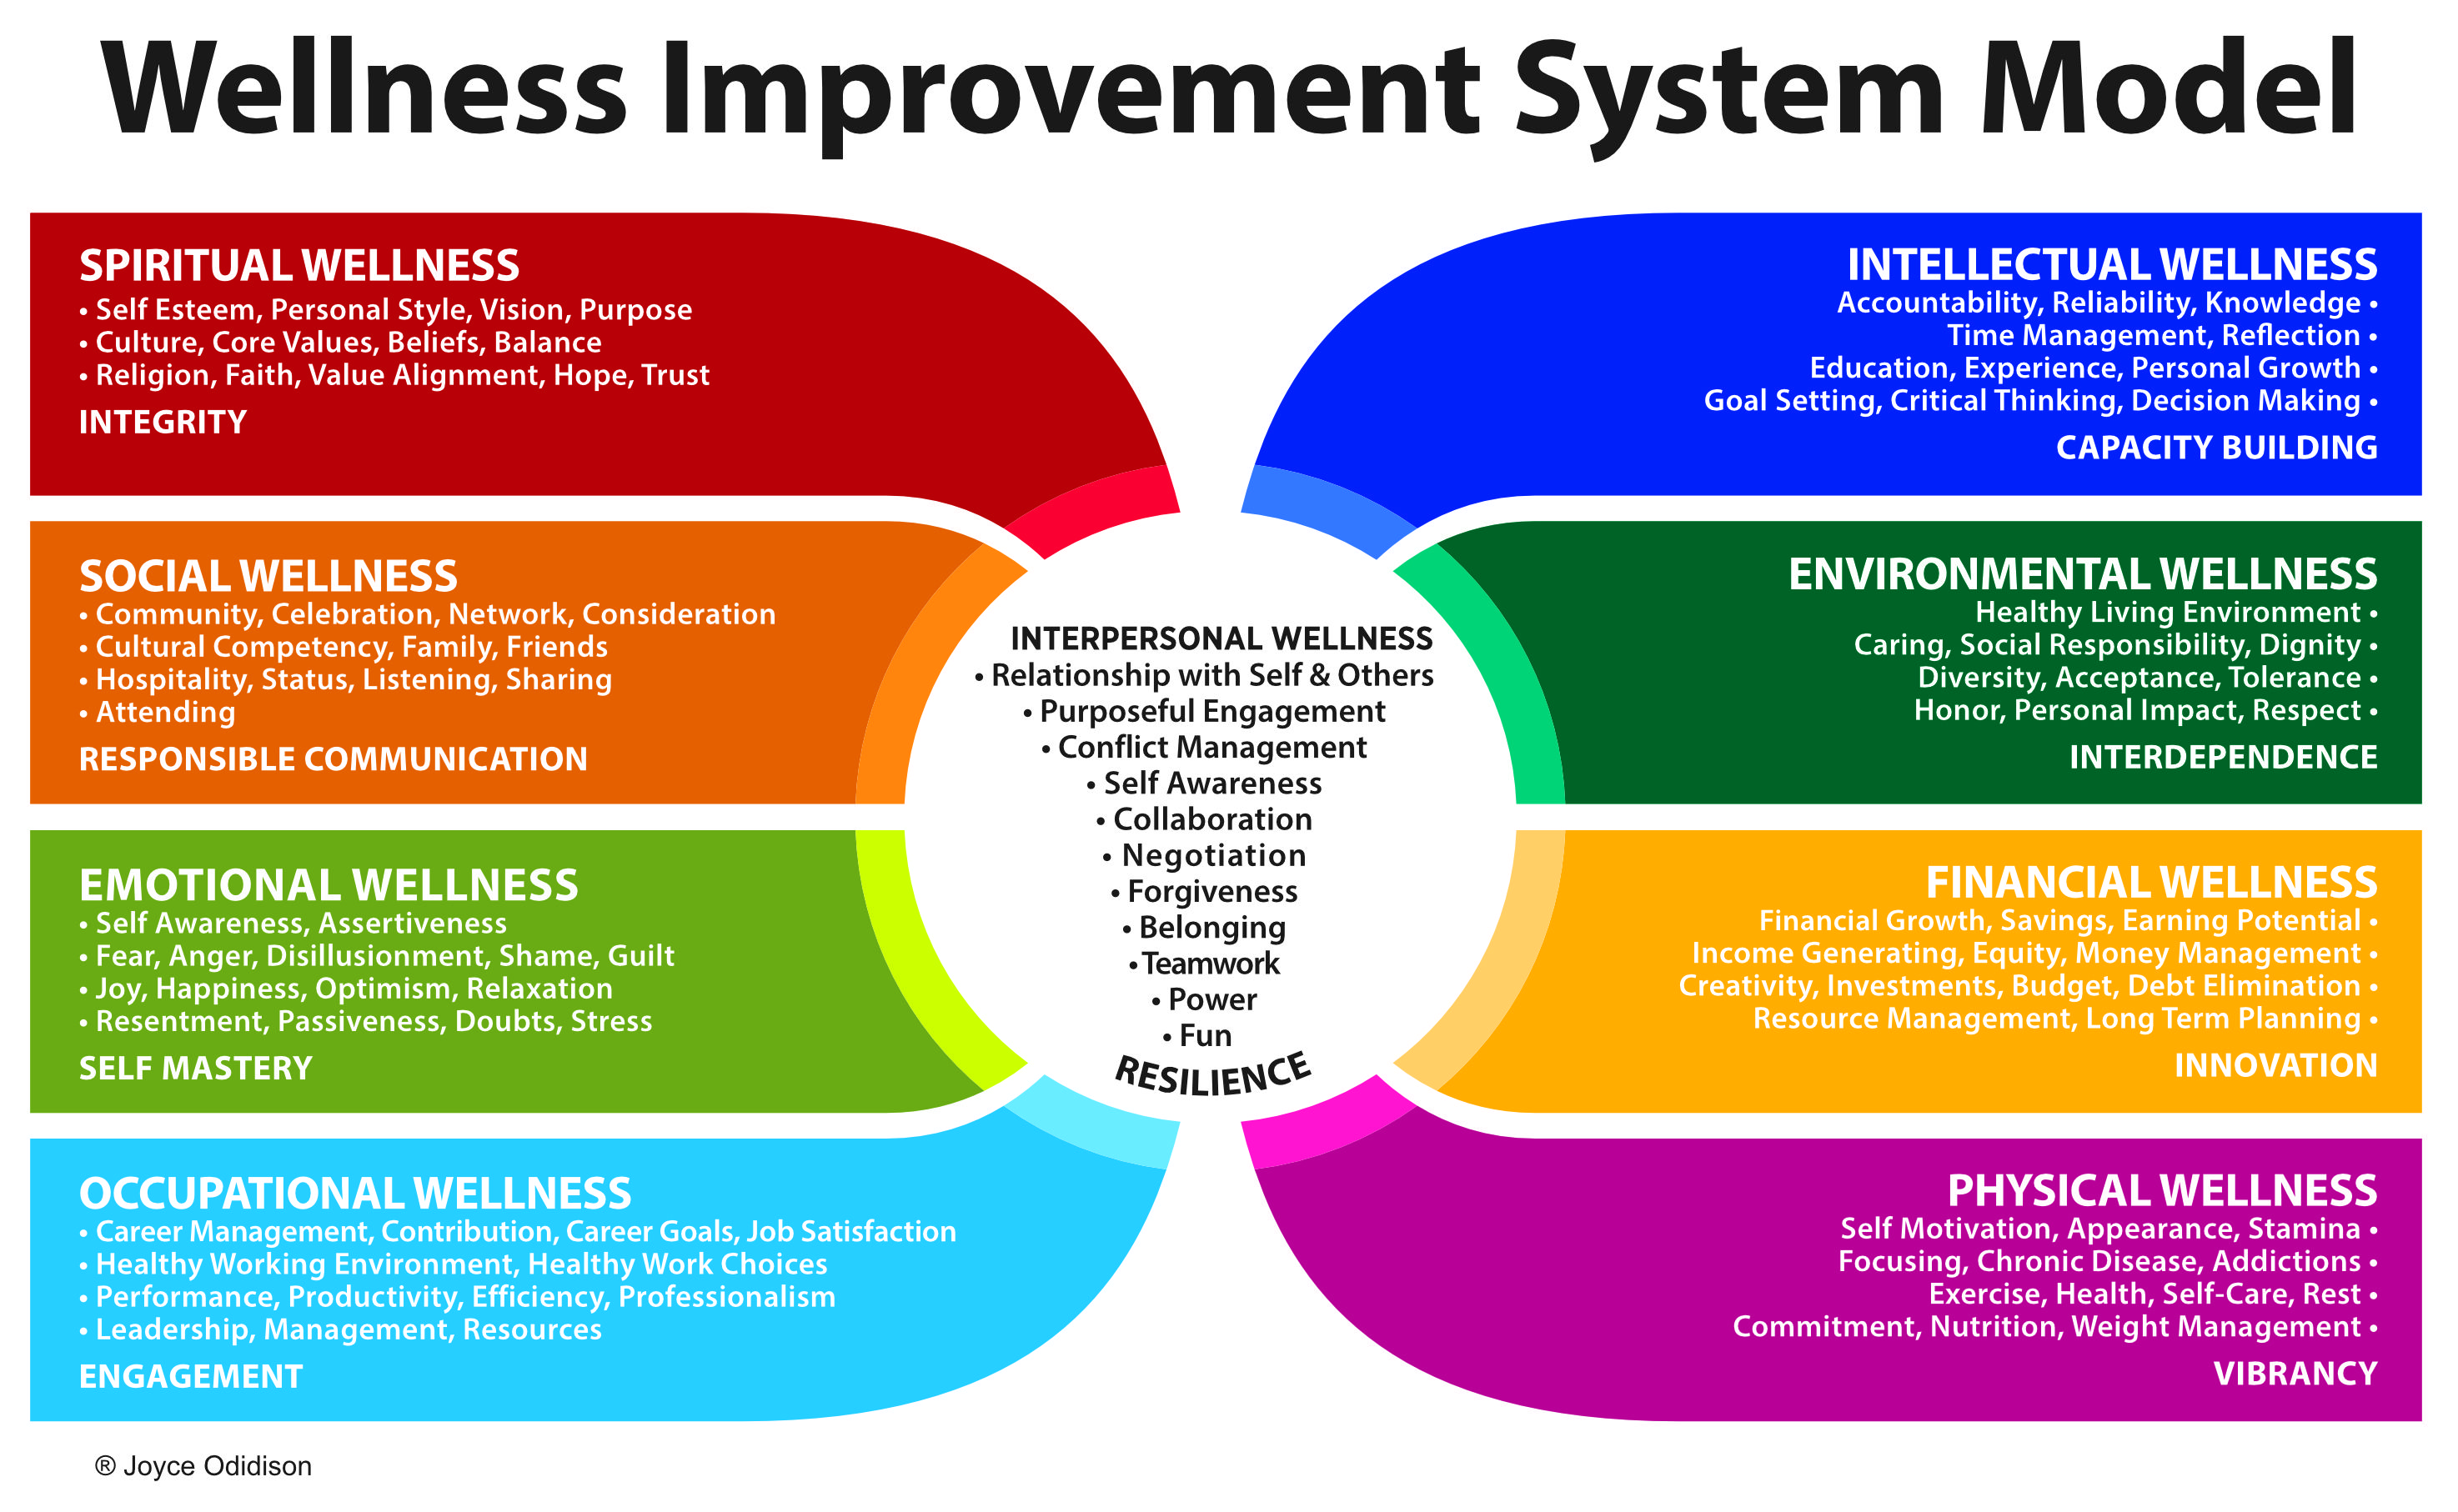 Wellness Improvement System Model